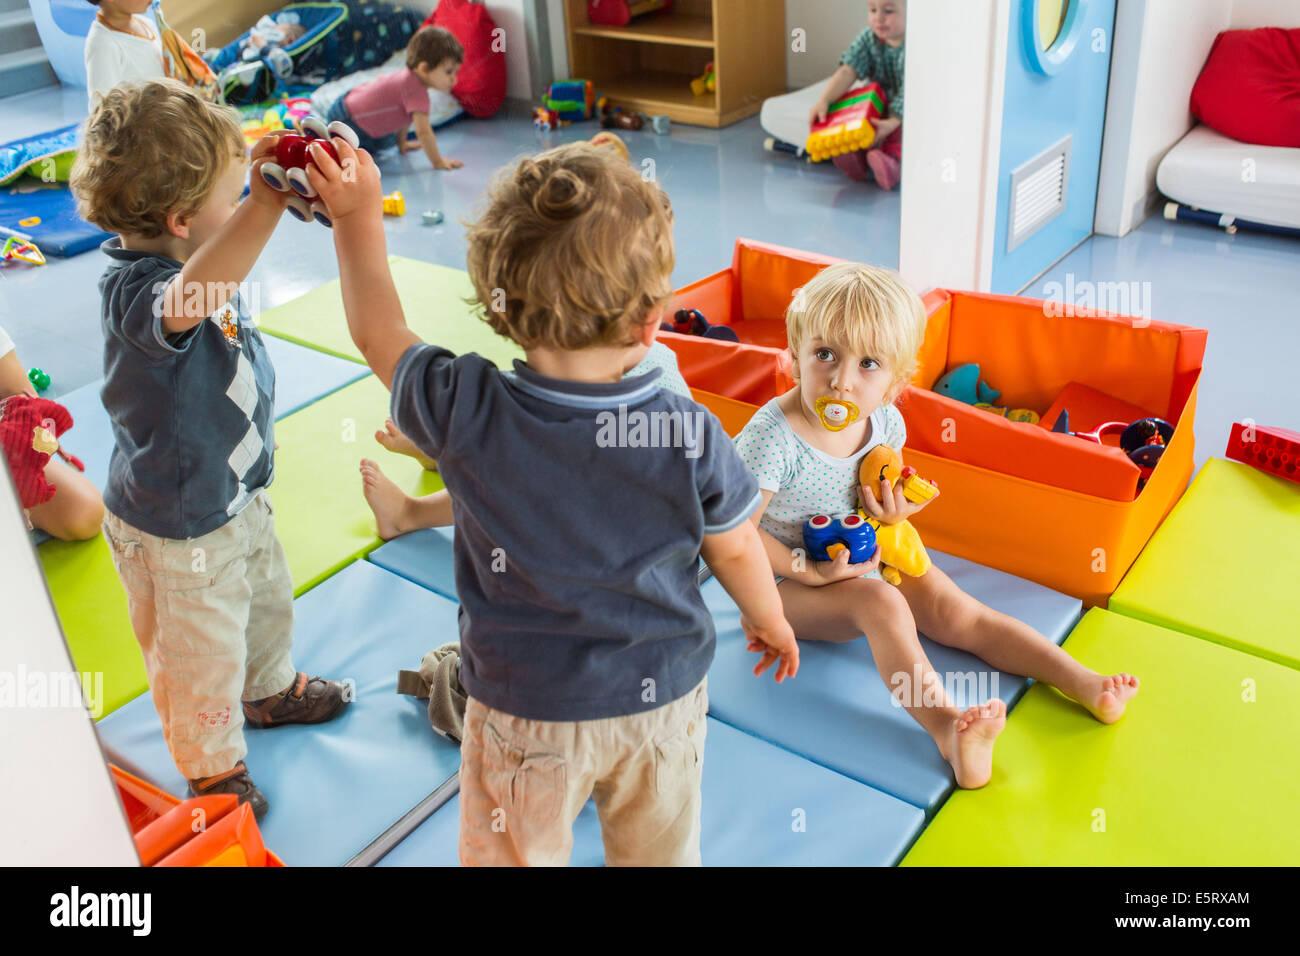 Day nursery, Angoulême, France. - Stock Image